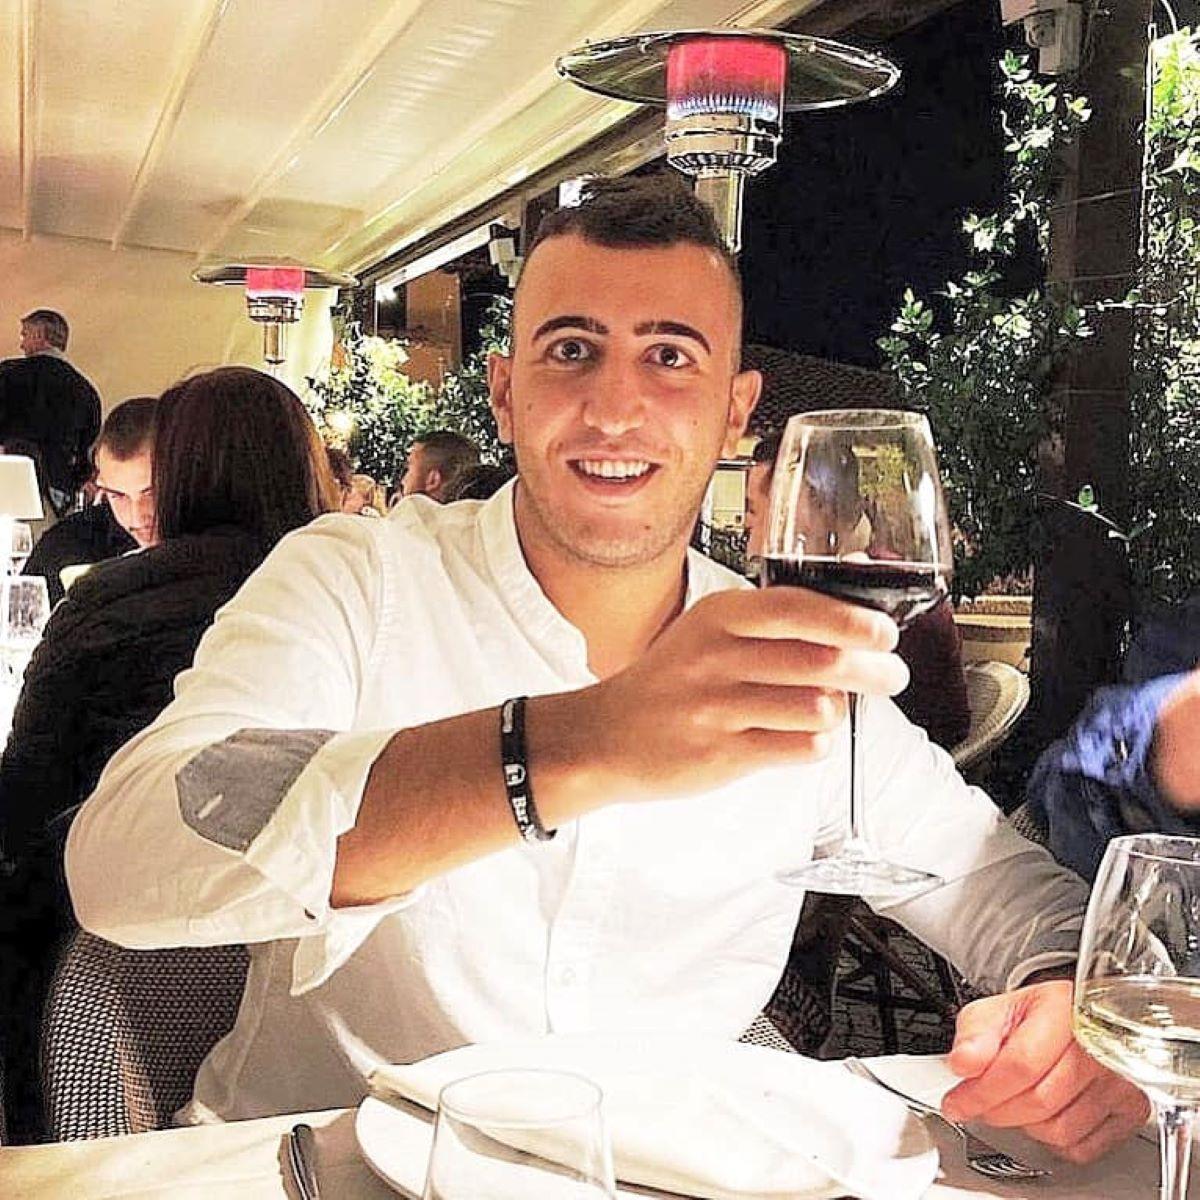 Giuseppe Vinci Morto Dopo Coronavirus Sardegna